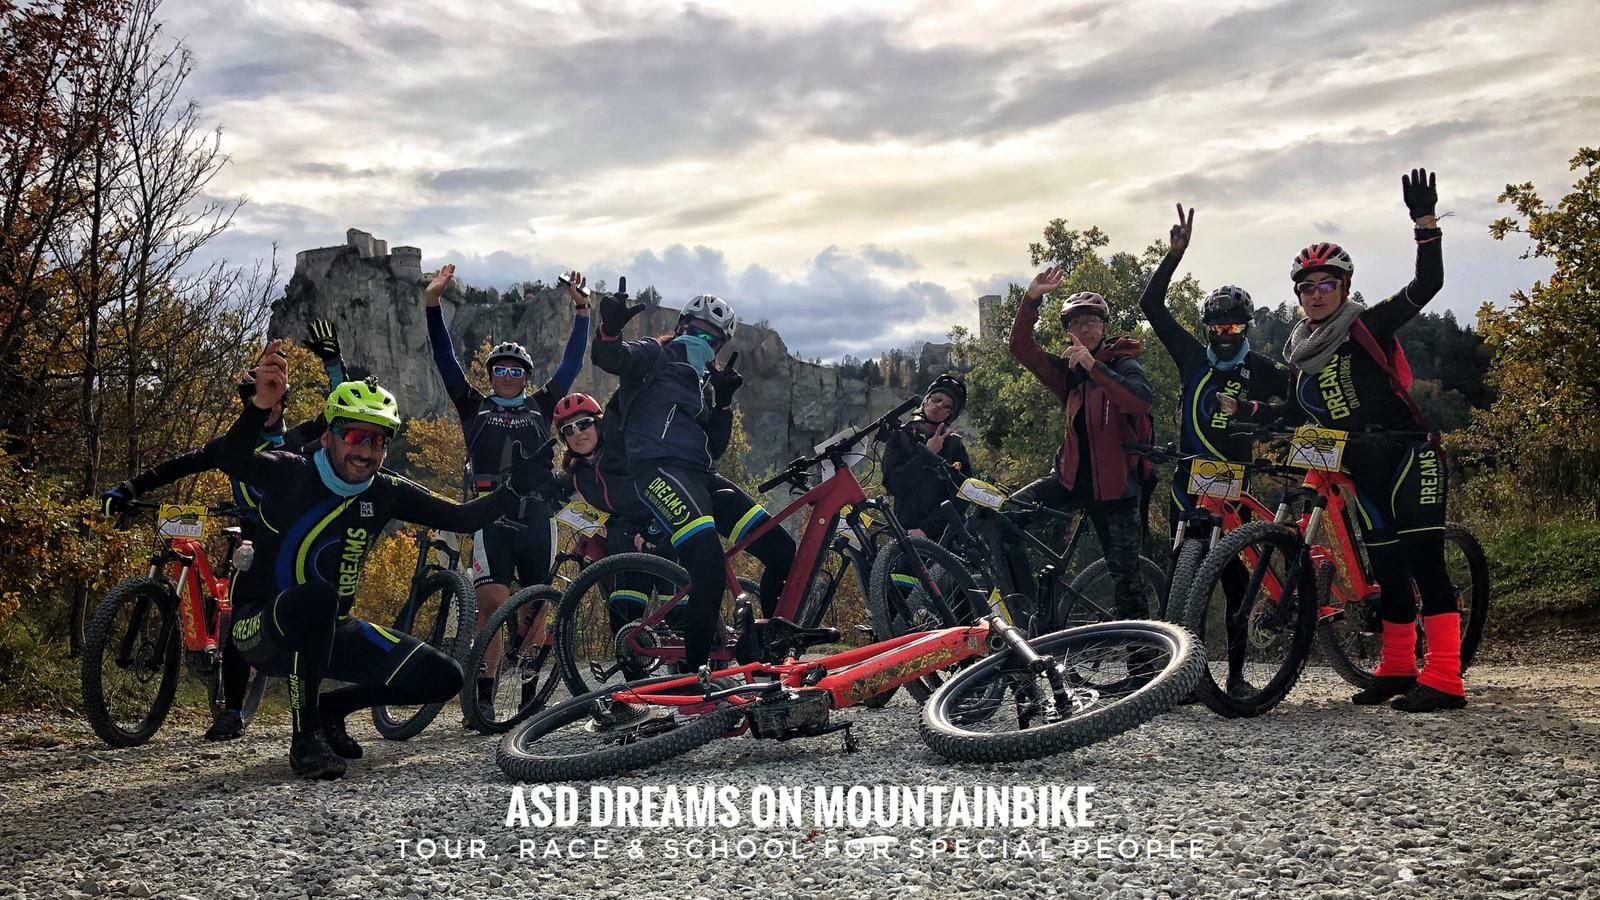 Dall'Etna a San Leo per una pedalata con BTR